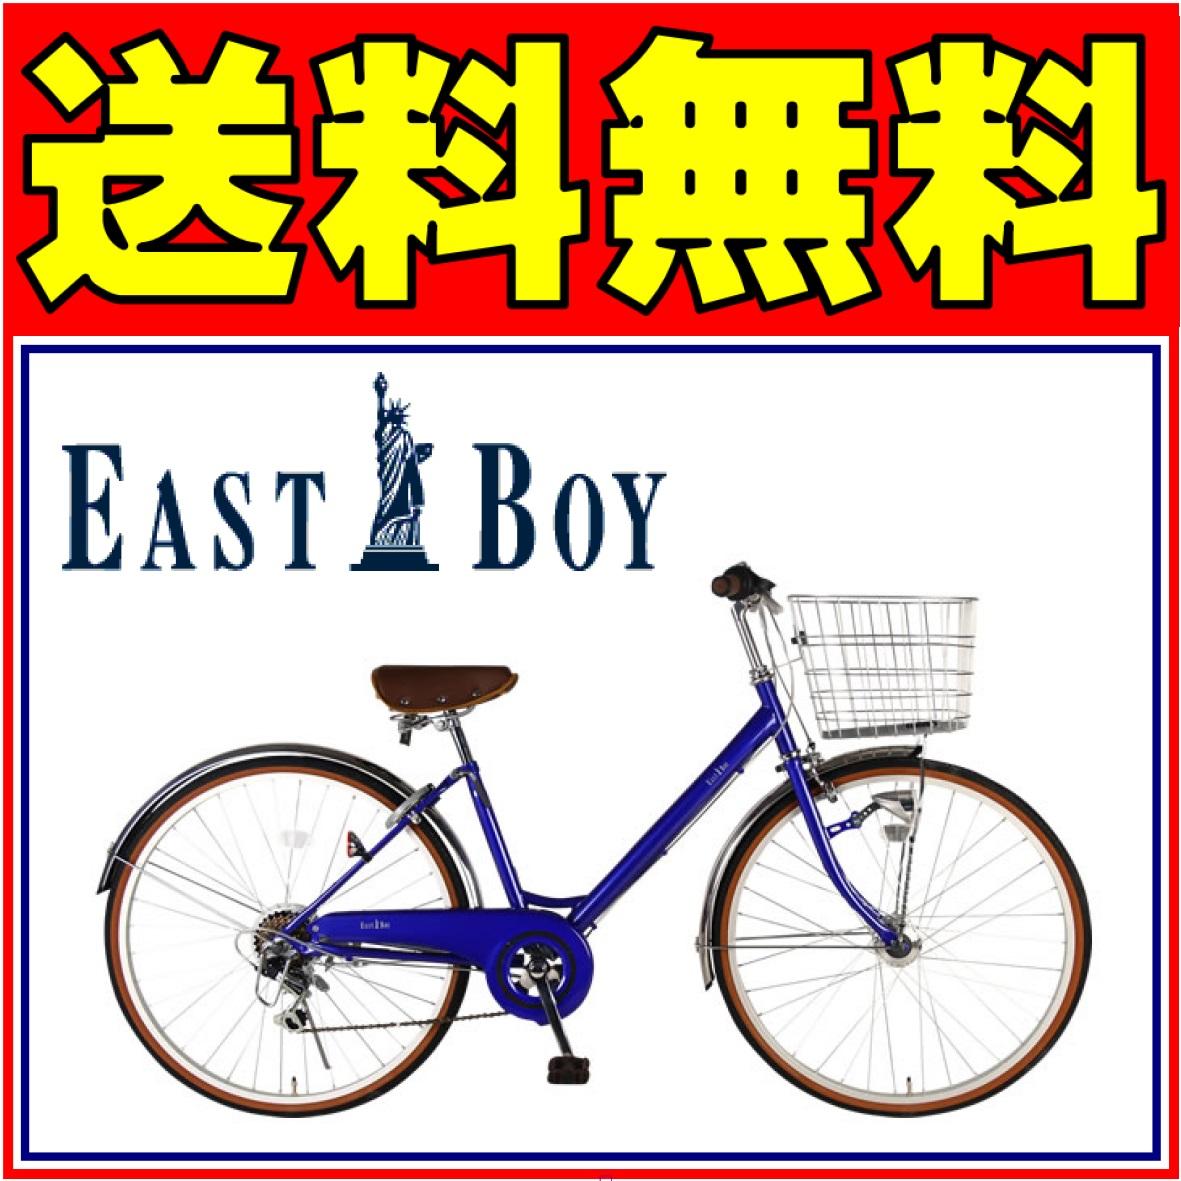 EASTBOY イーストボーイ 自転車 シティサイクル ブルー 女子高生、女子中学生の通学に最適 カジュアルシティ 外装6段ギア シティ車 26インチ 鍵付き LEDオートライト イーストボーイ 自転車 女子